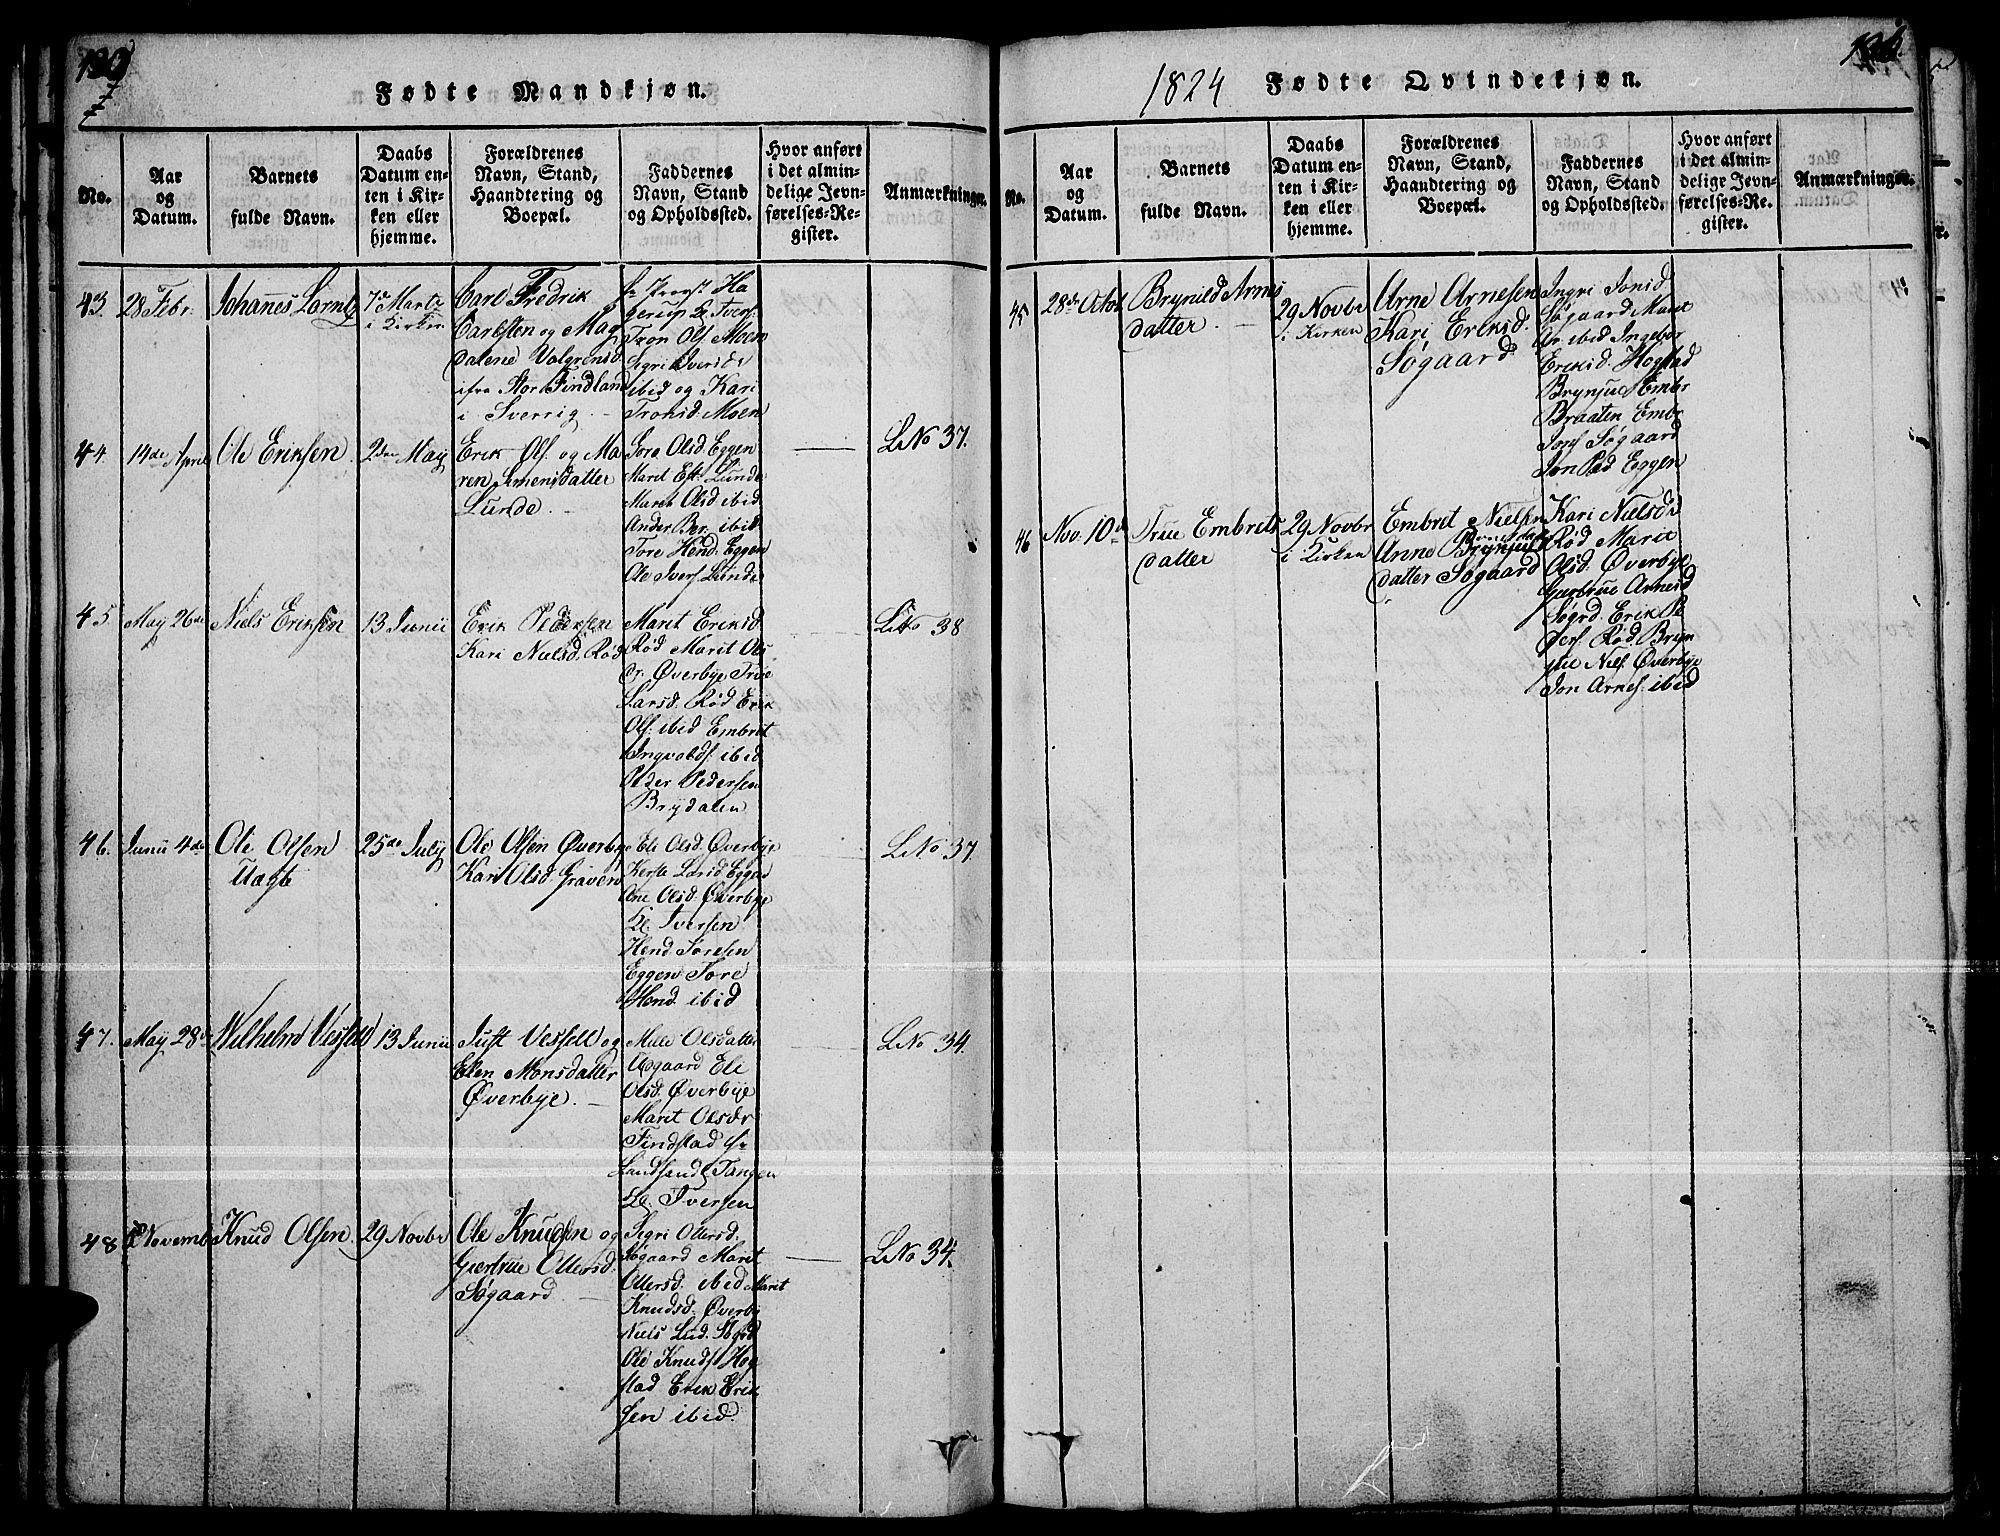 SAH, Tynset prestekontor, Ministerialbok nr. 18, 1815-1829, s. 130-131